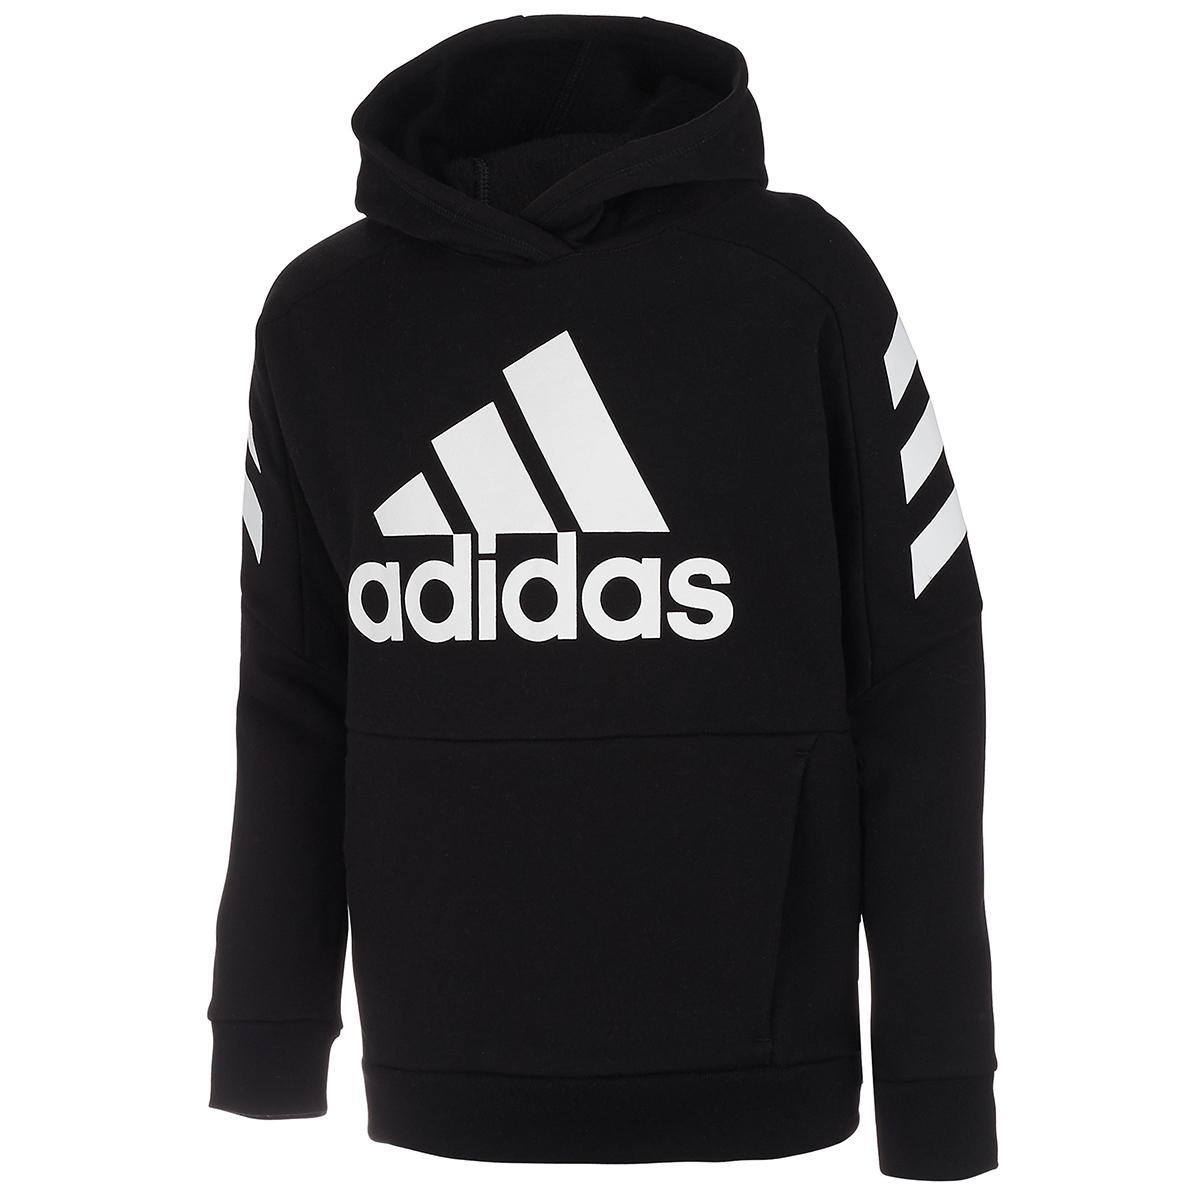 Adidas Boys' 8-20 Block Fleece Pullover Hoodie - Black, M